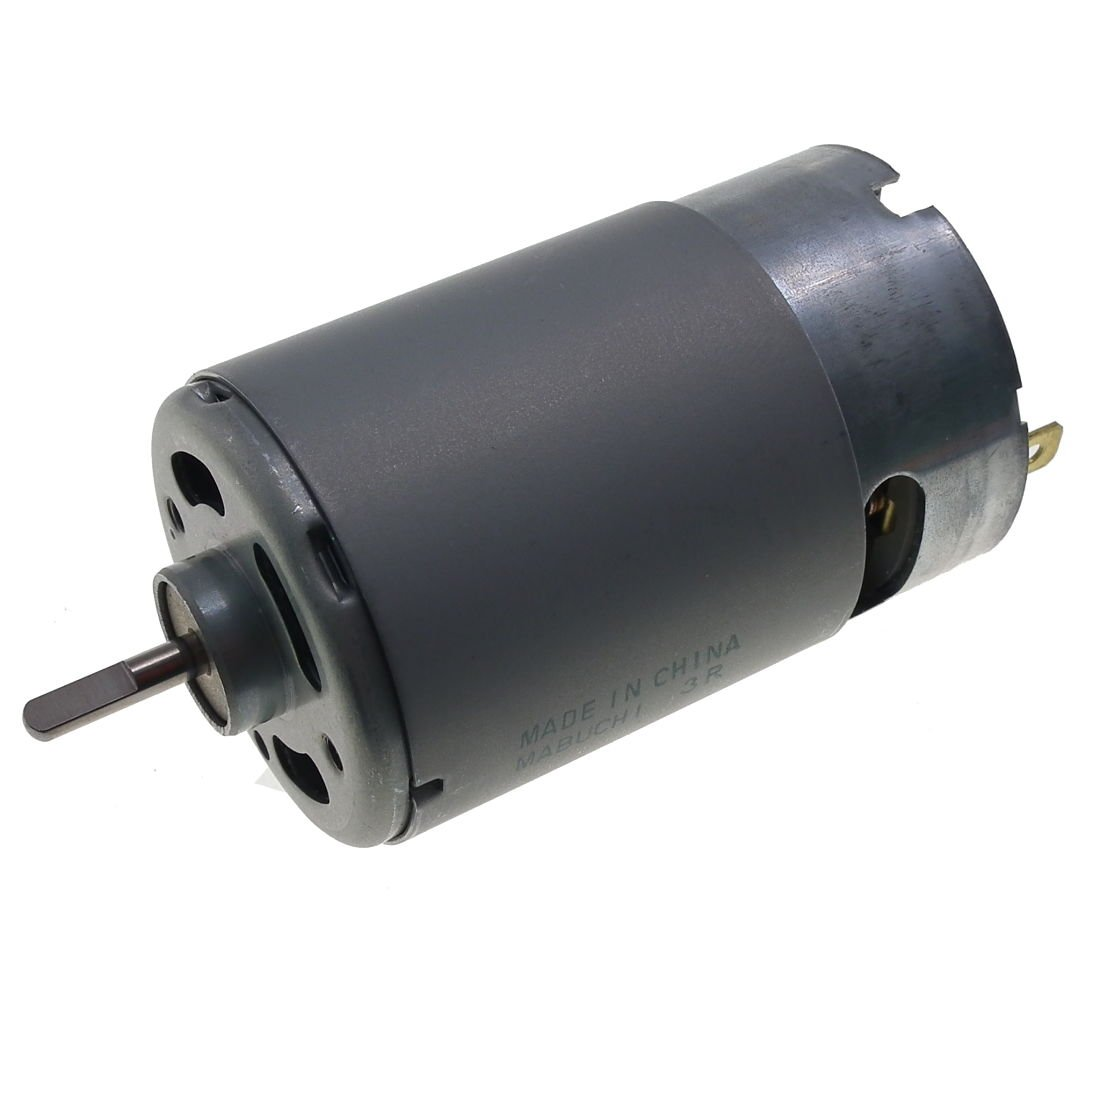 generator motor. Mabuchi 555 DC Motor - Wind / Water Turbine Generator 12 V 1 Per 500 RPM: Amazon.co.uk: Toys \u0026 Games